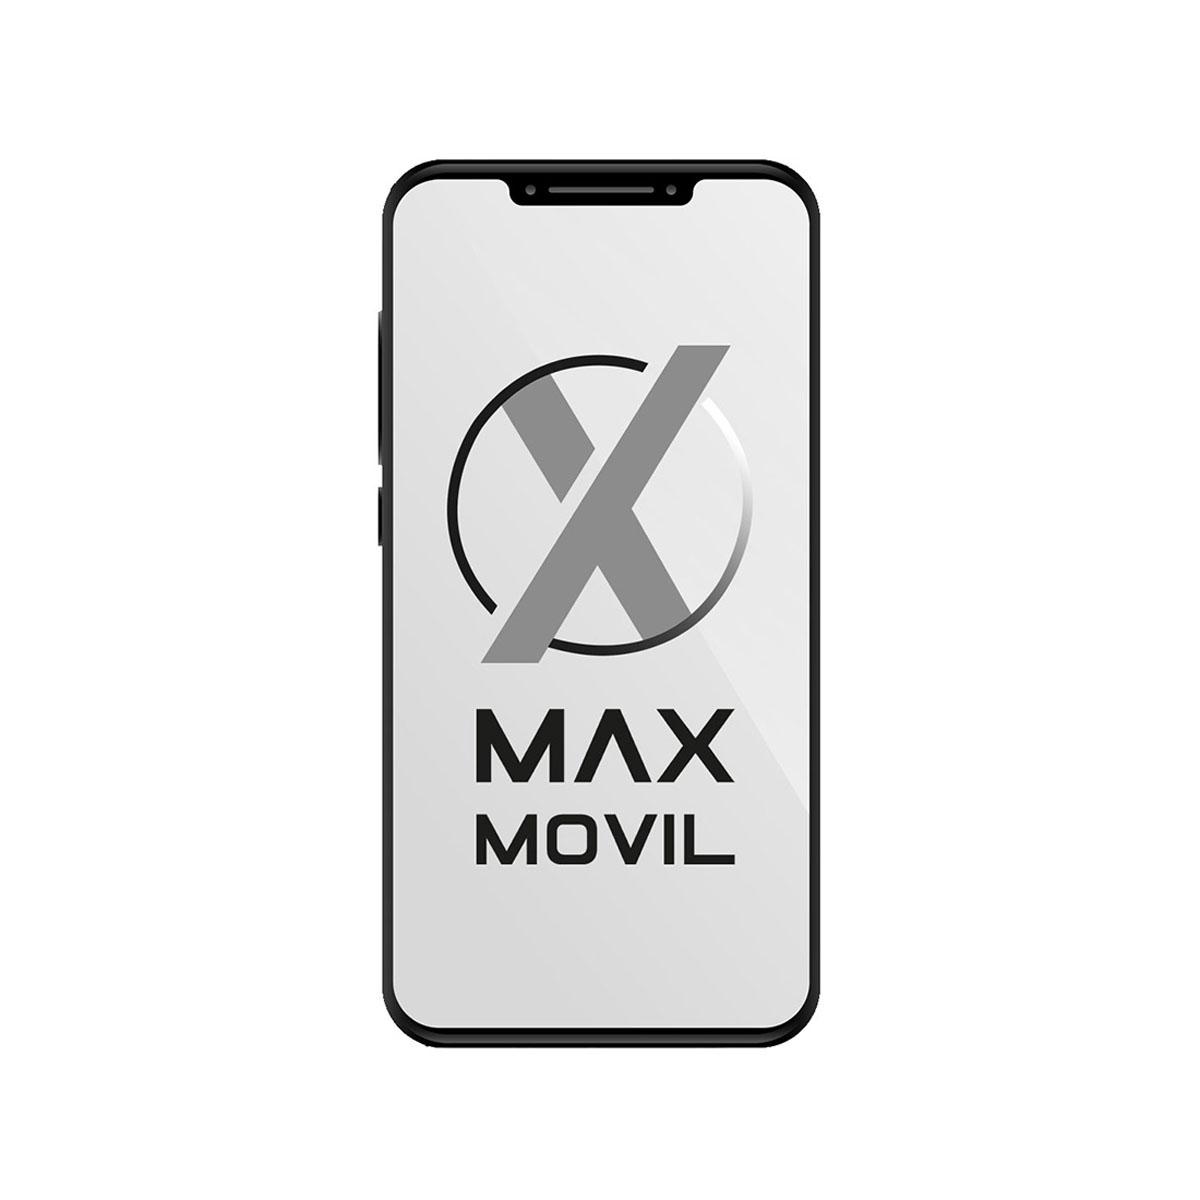 Tapa de batería Sony Xperia Sola MT27i blanca